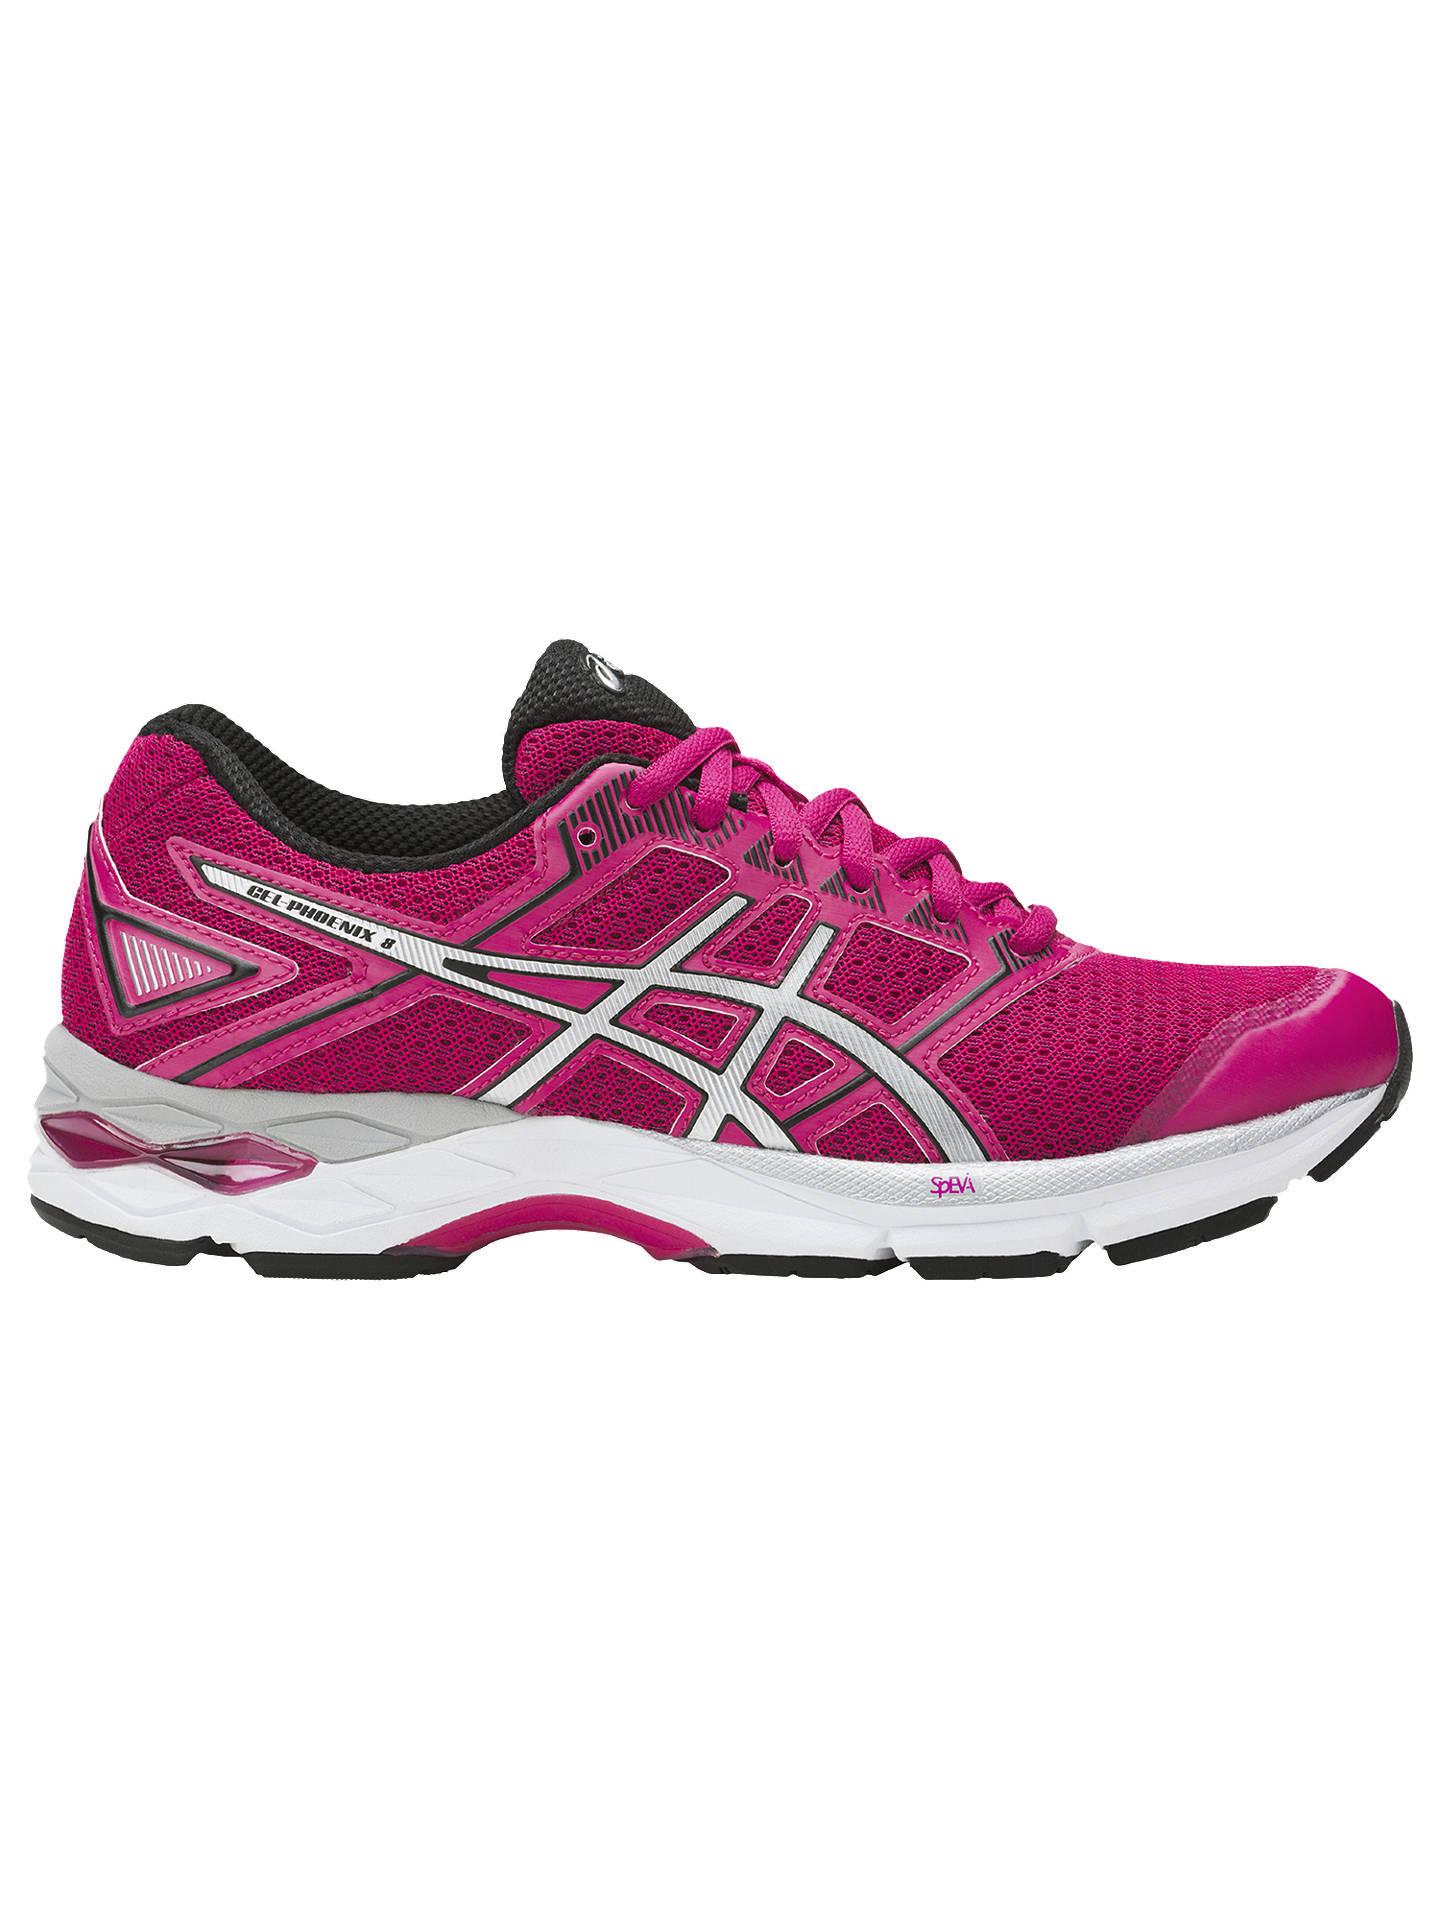 Asics Running Women's Gel Phoenix 8 Trainers Pink